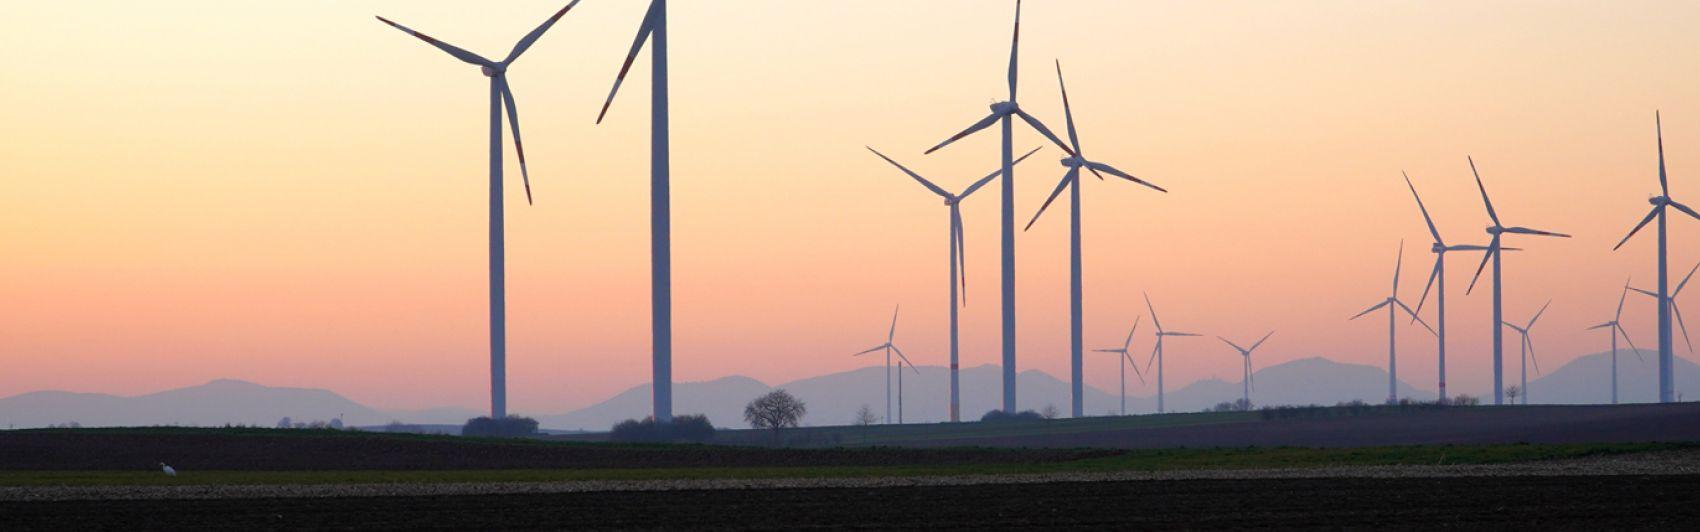 Windkraftanlagen, Turbinen